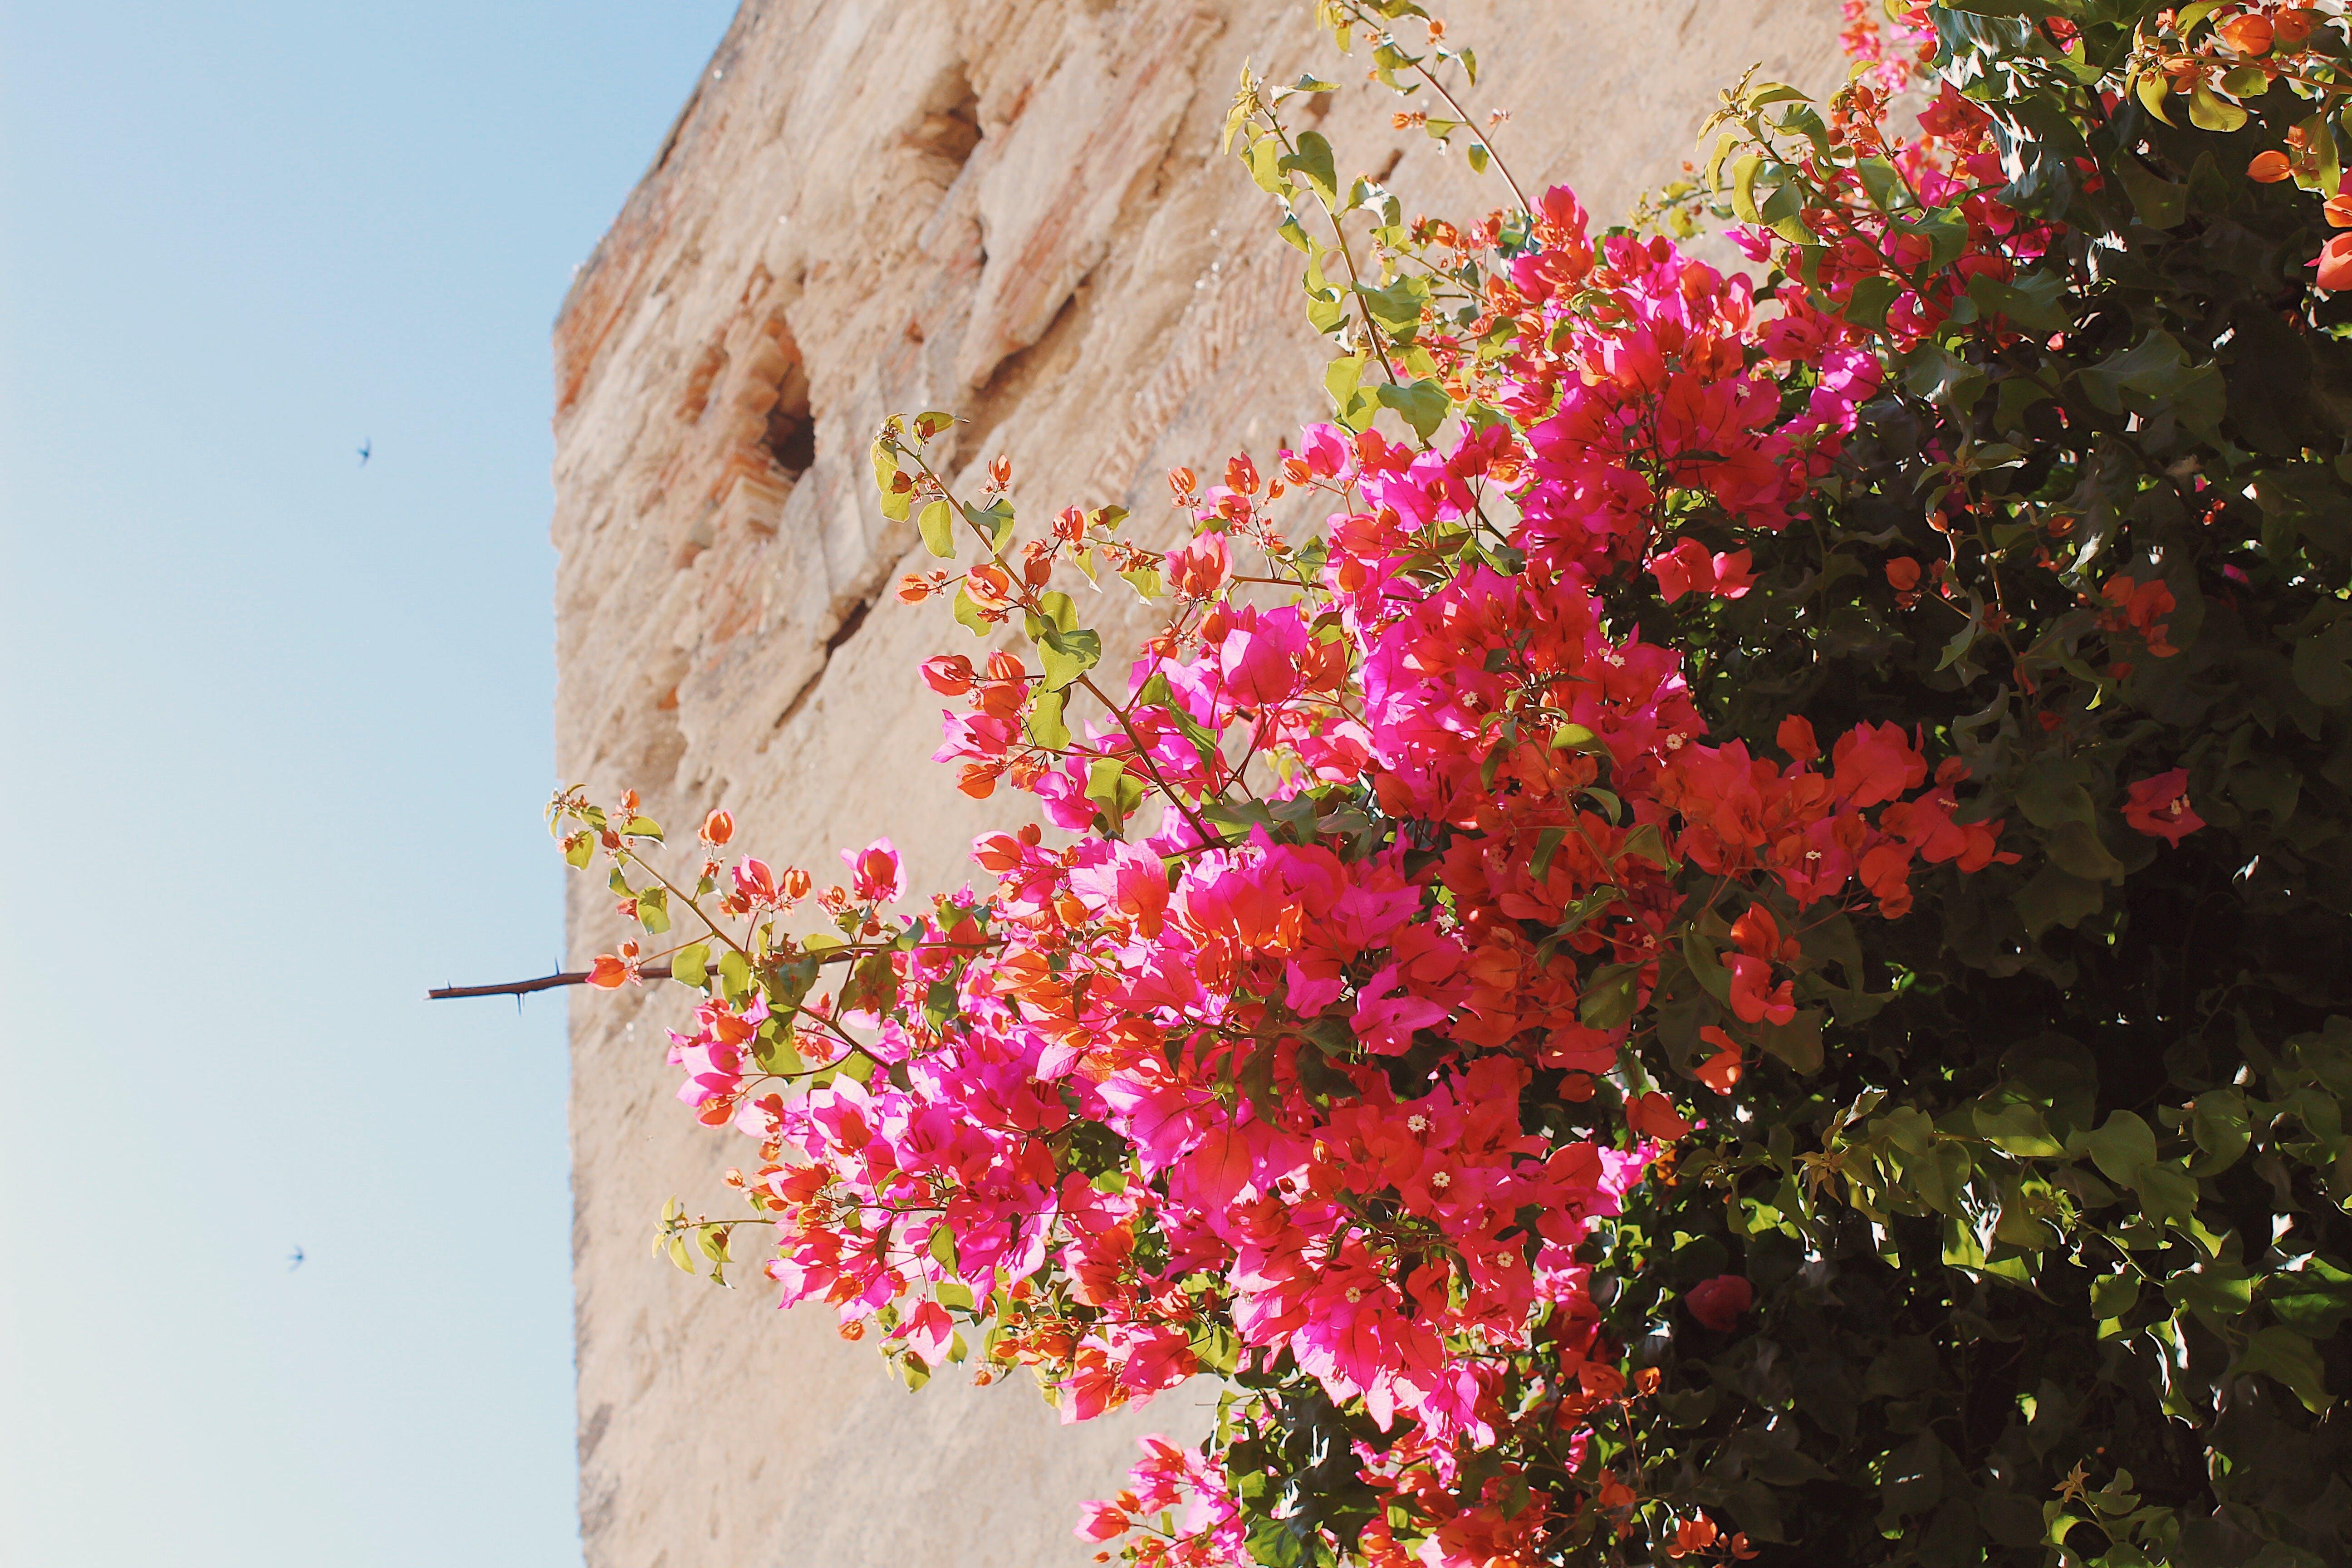 Gratis arkivbilde med årstid, betong, blomster, blomsterblad